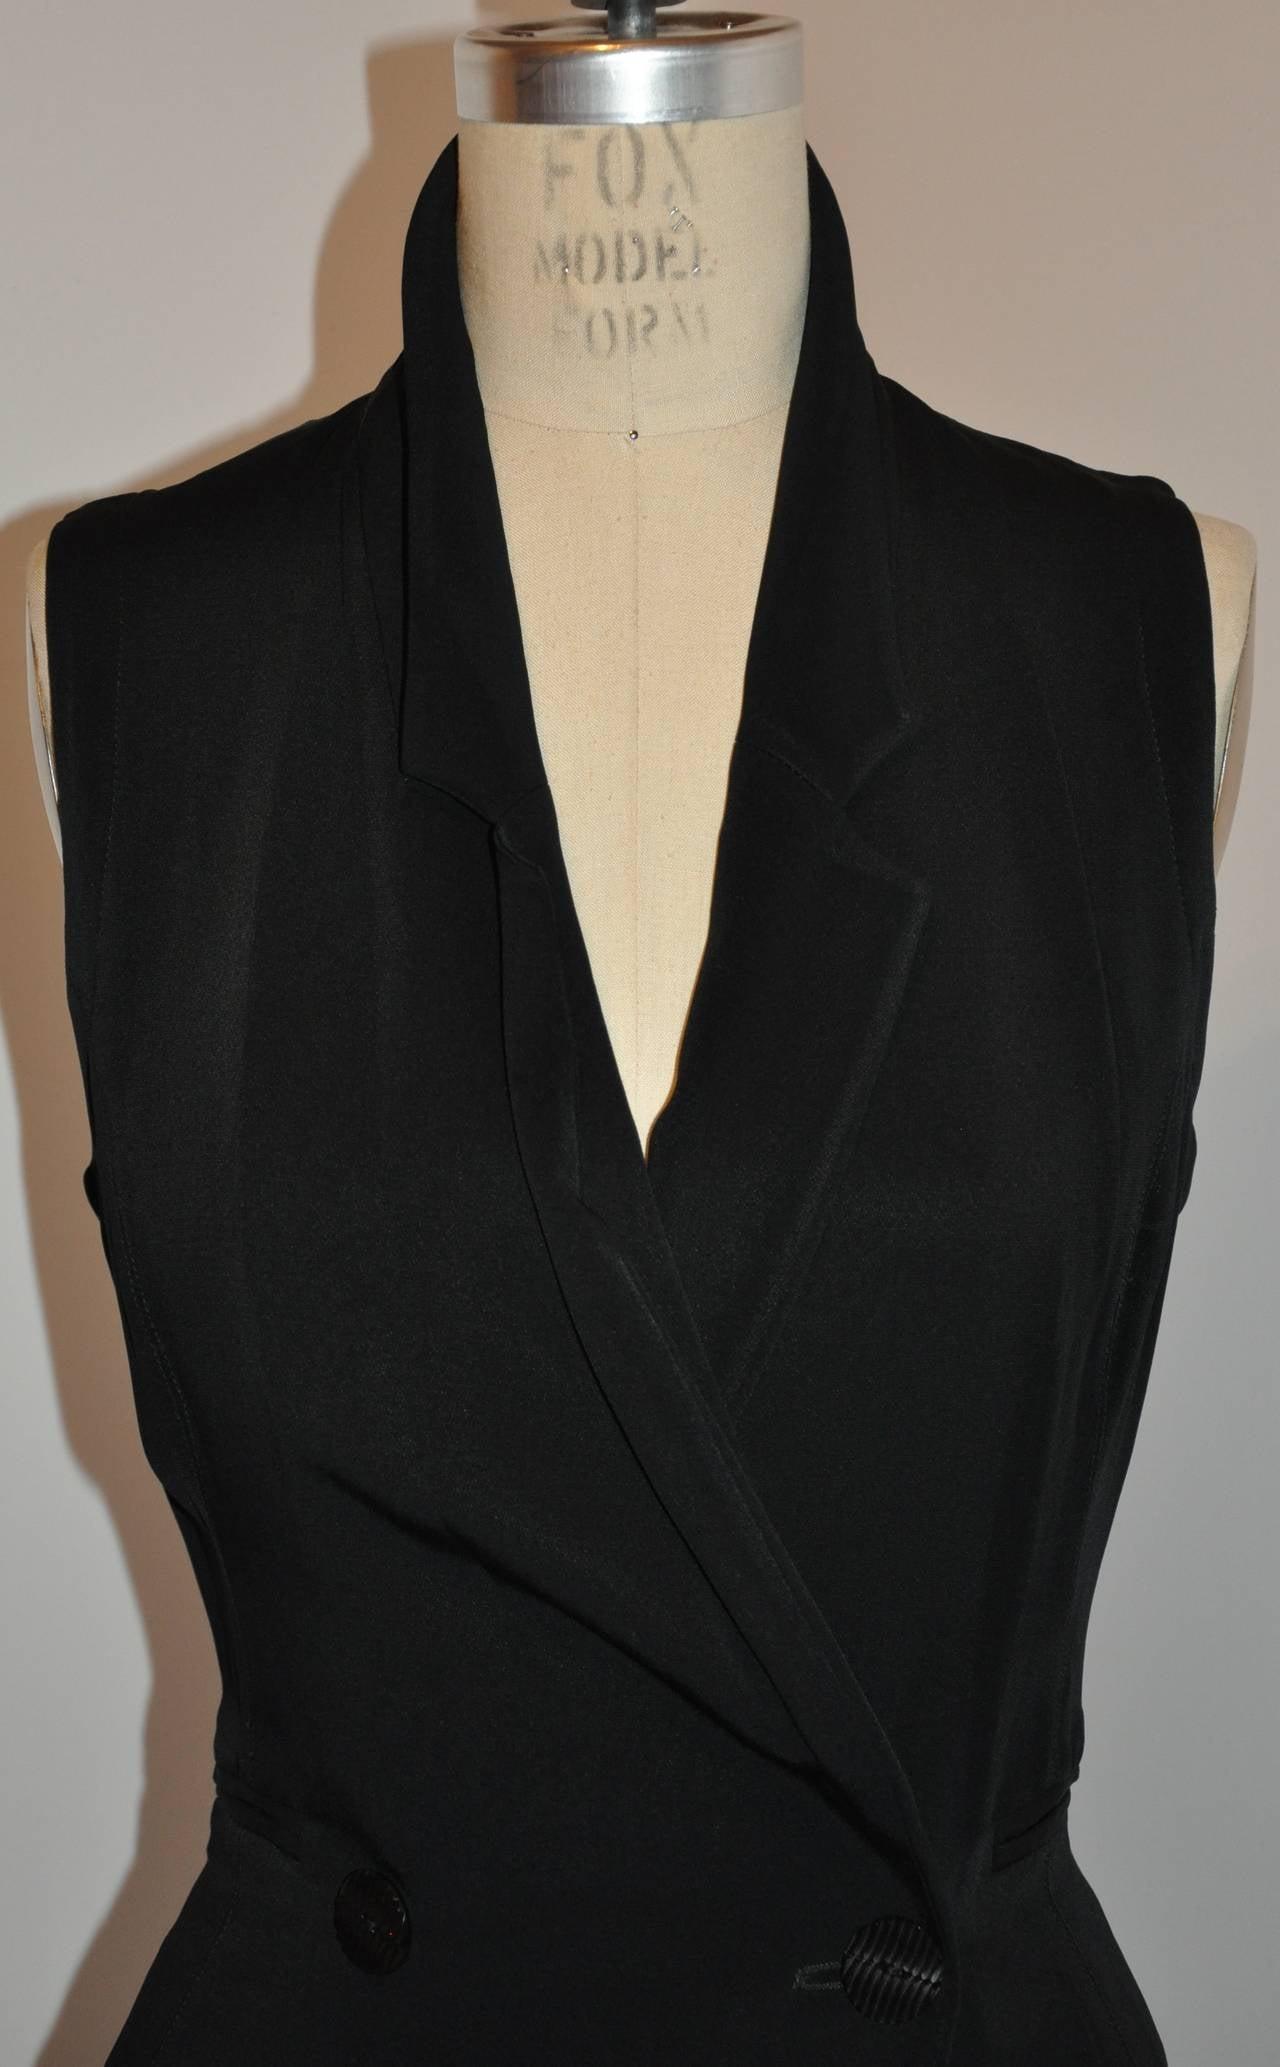 Ozbek Black Asymmetrical Double Breasted Sleeveless Dress 5